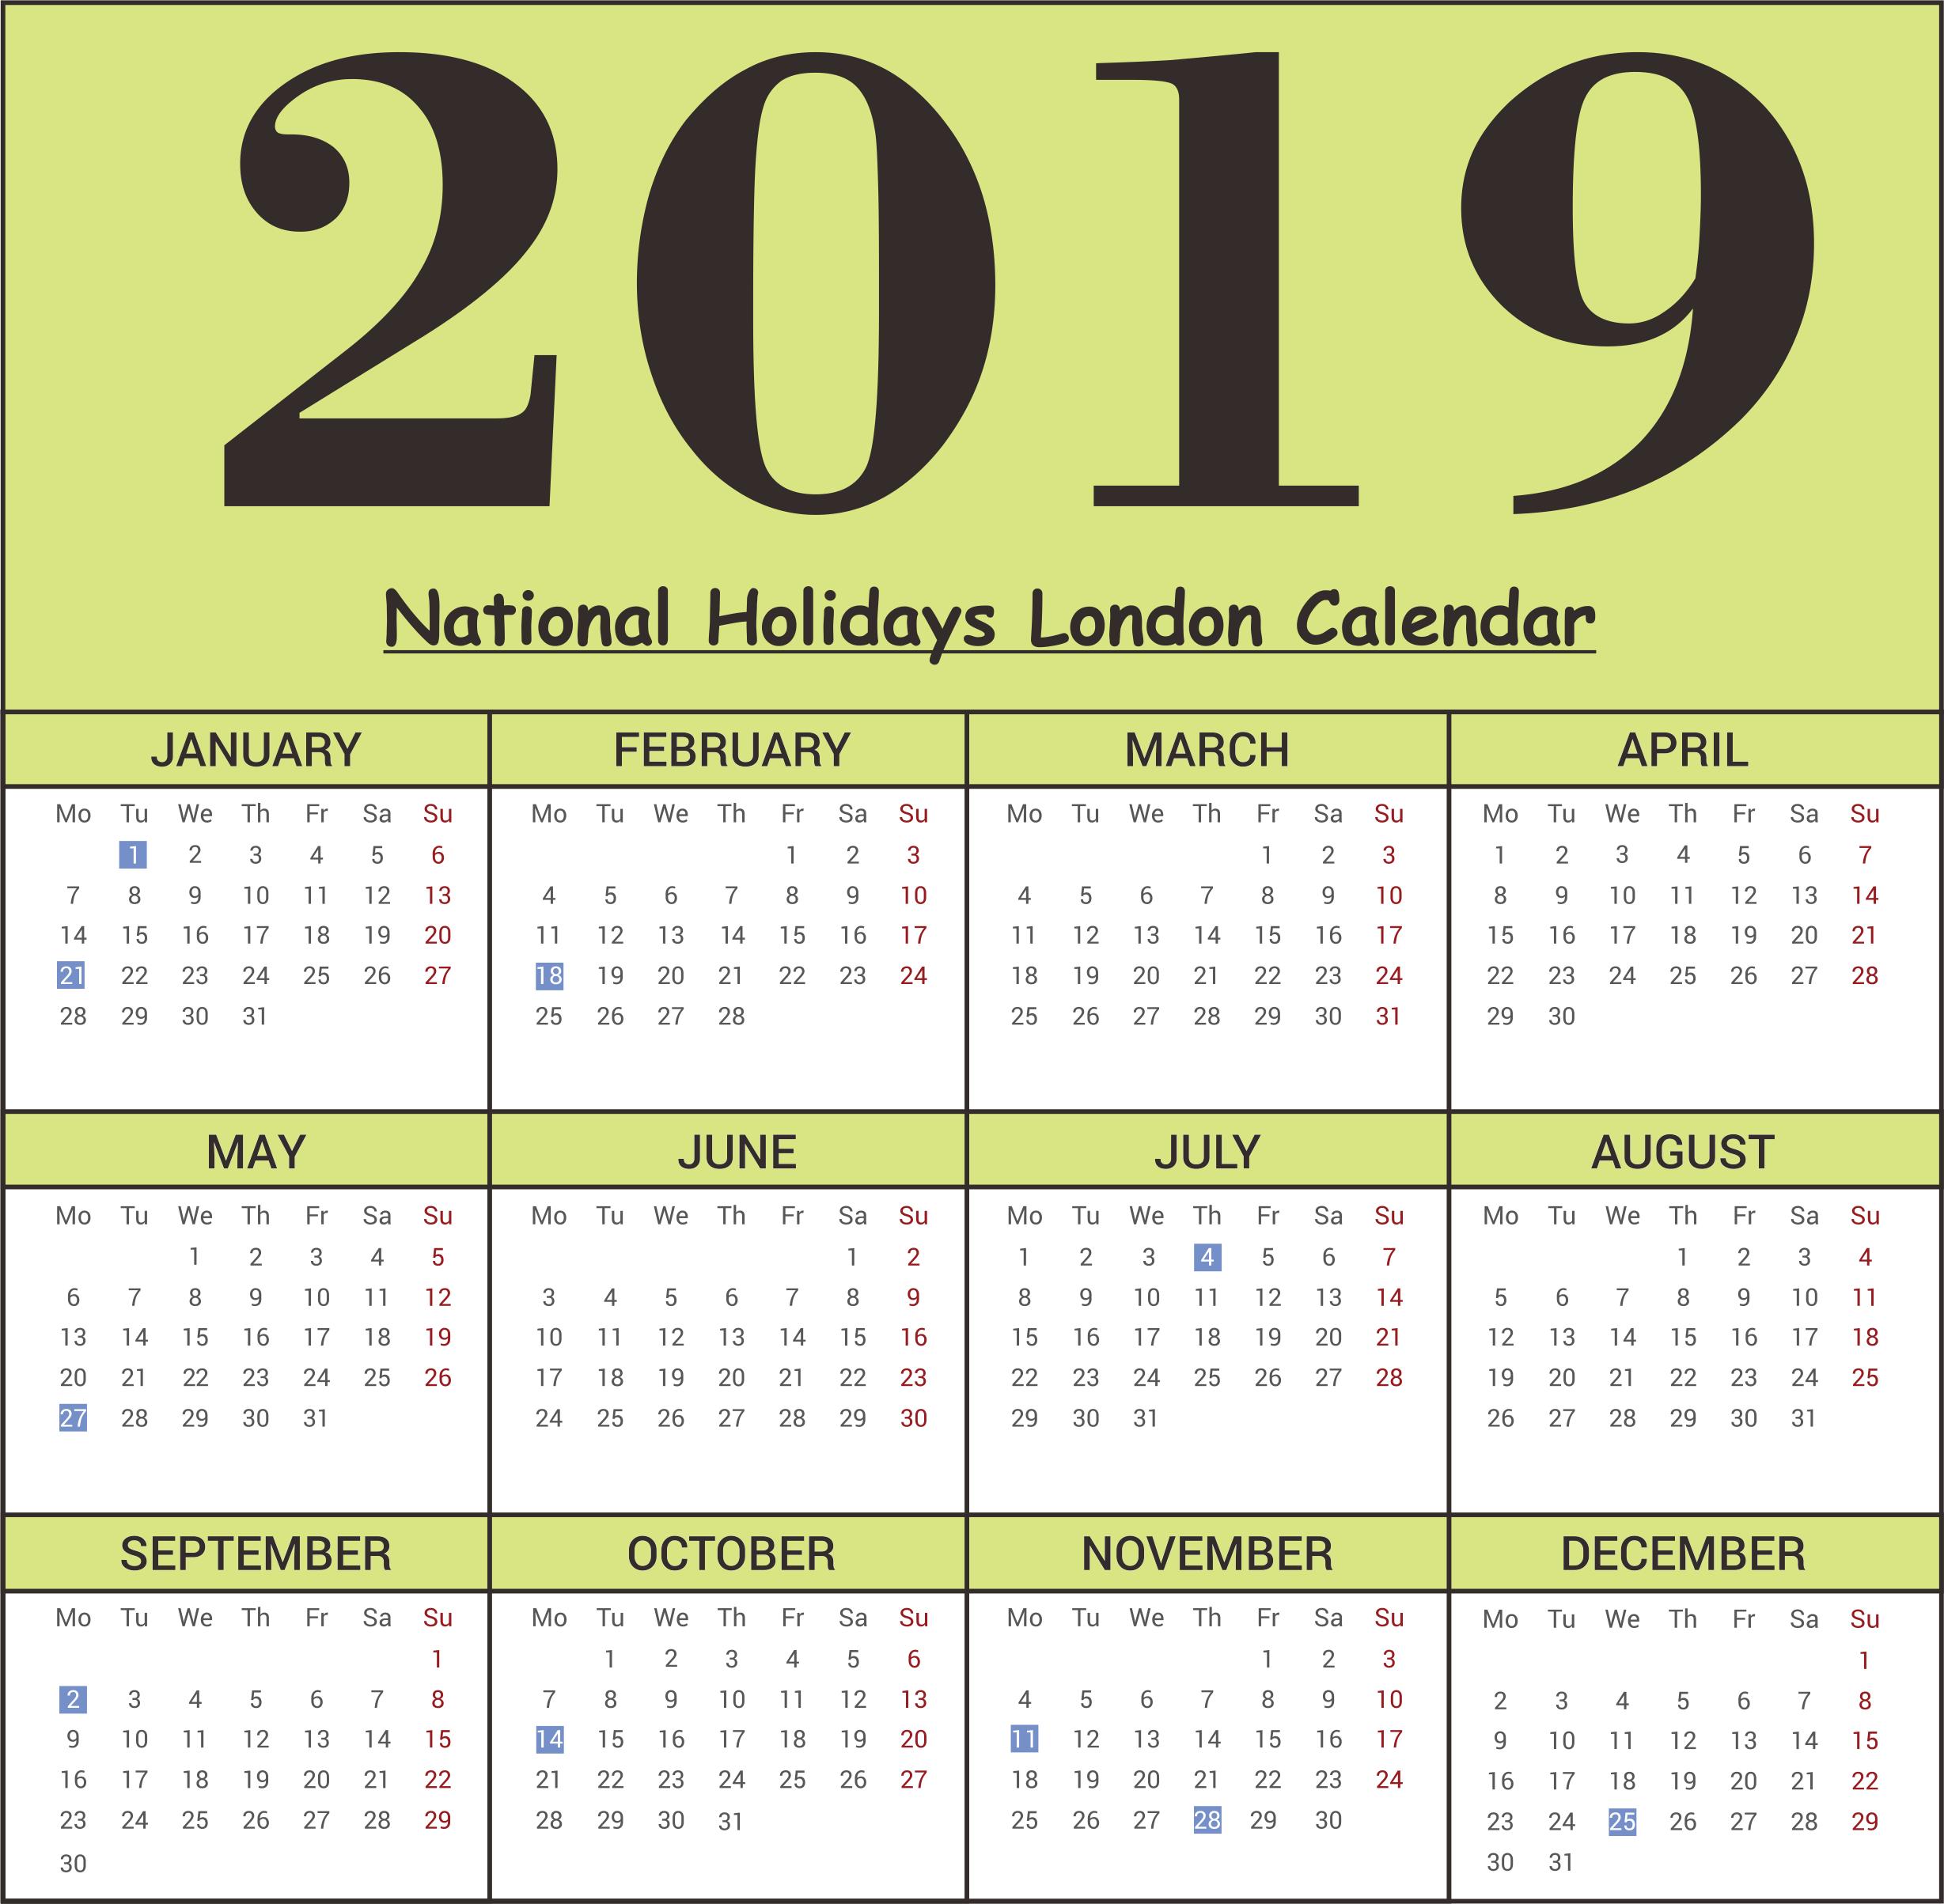 2019 National Holidays London